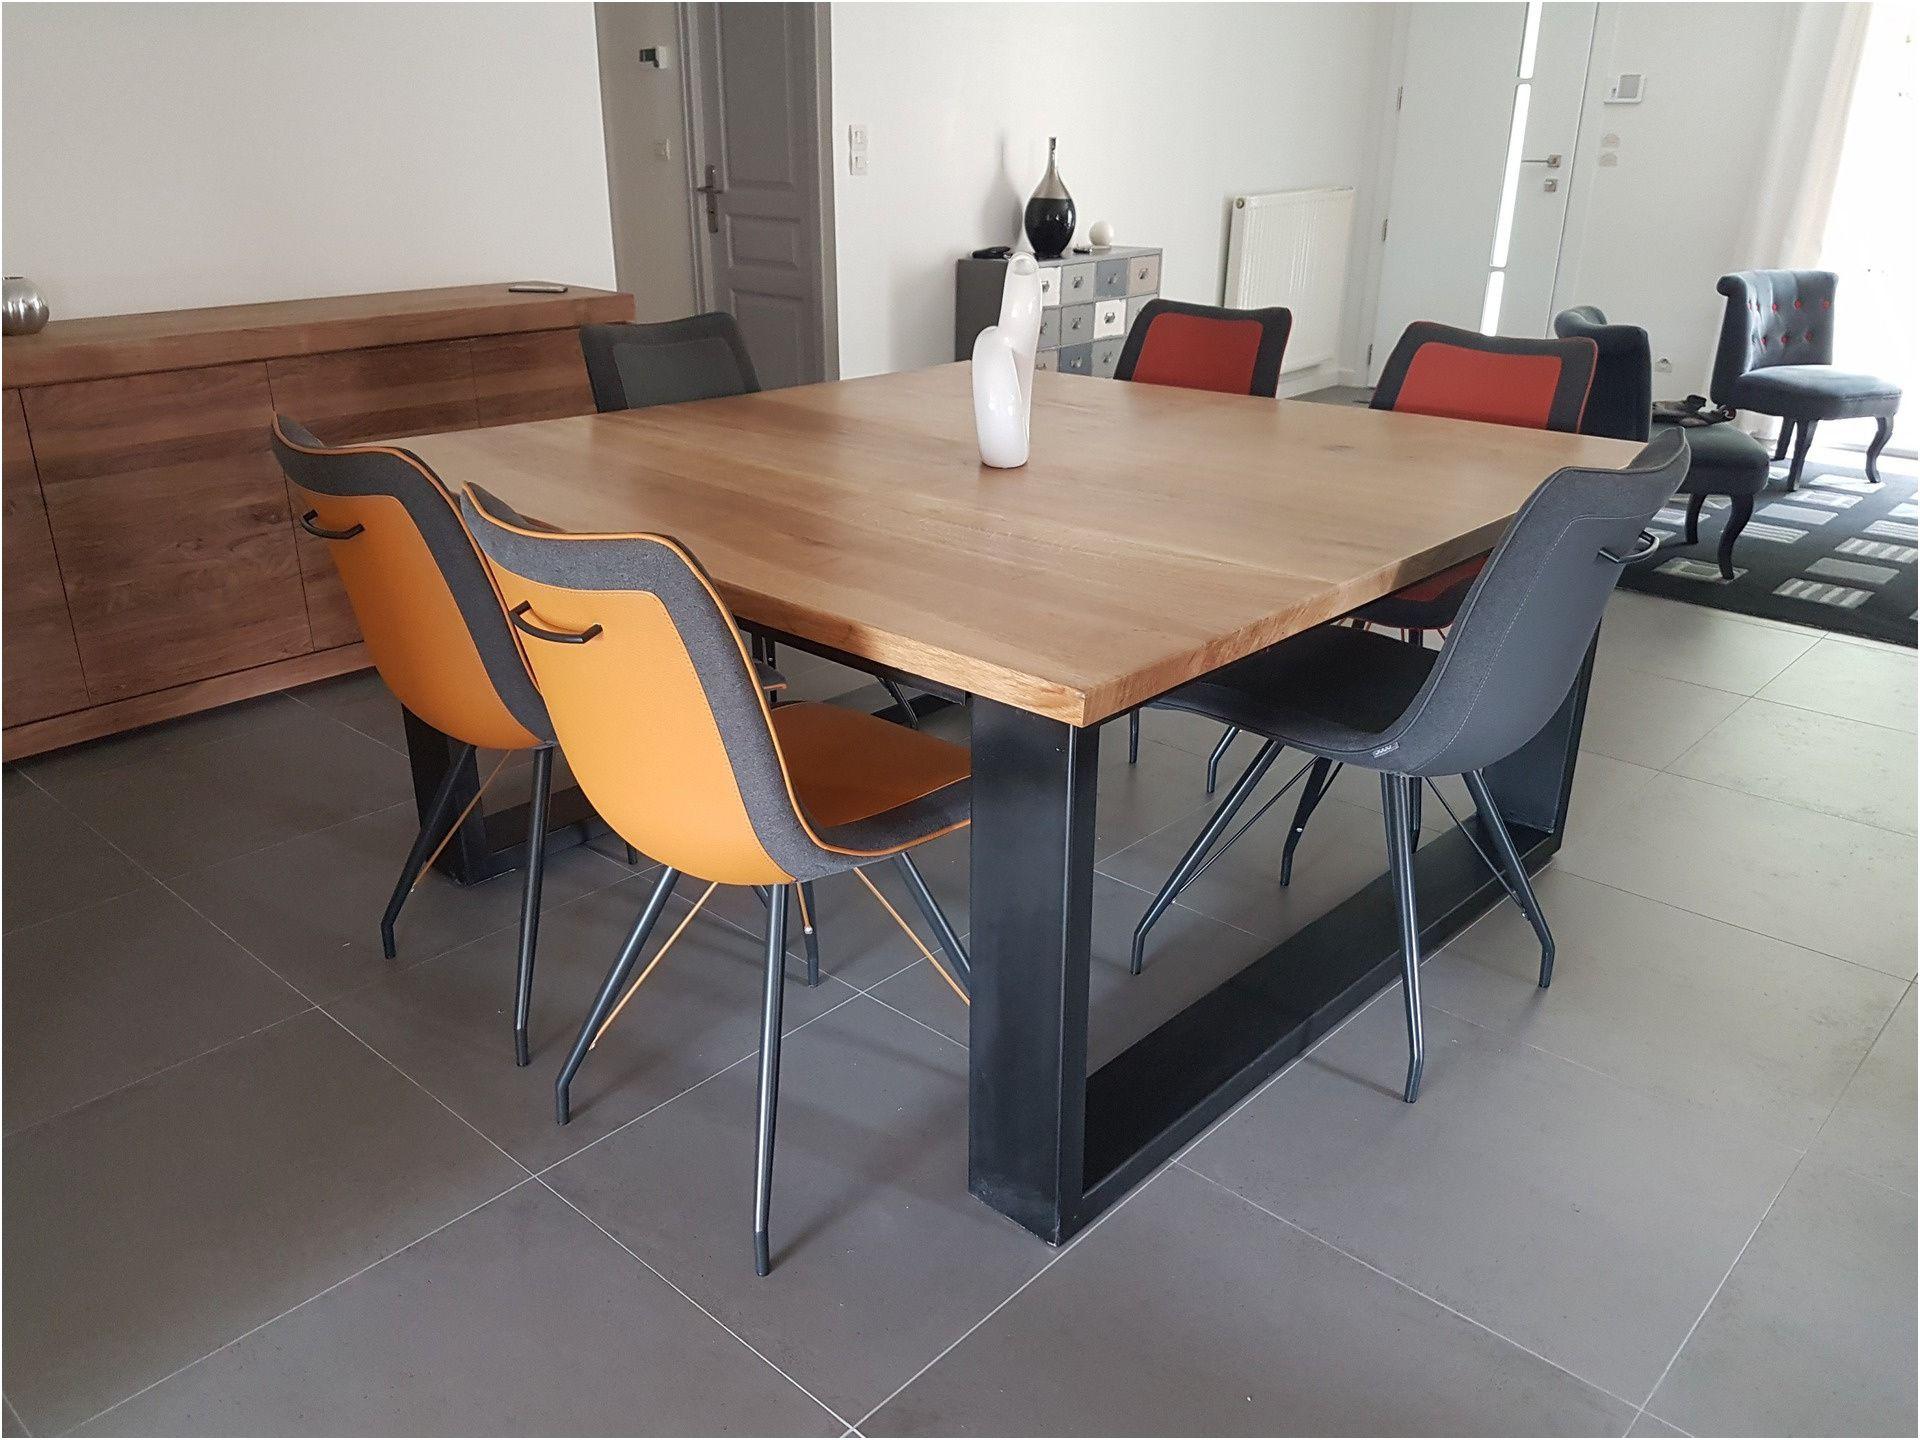 Table De Salle A Manger Avec Allonge Dordogne Table Salle A